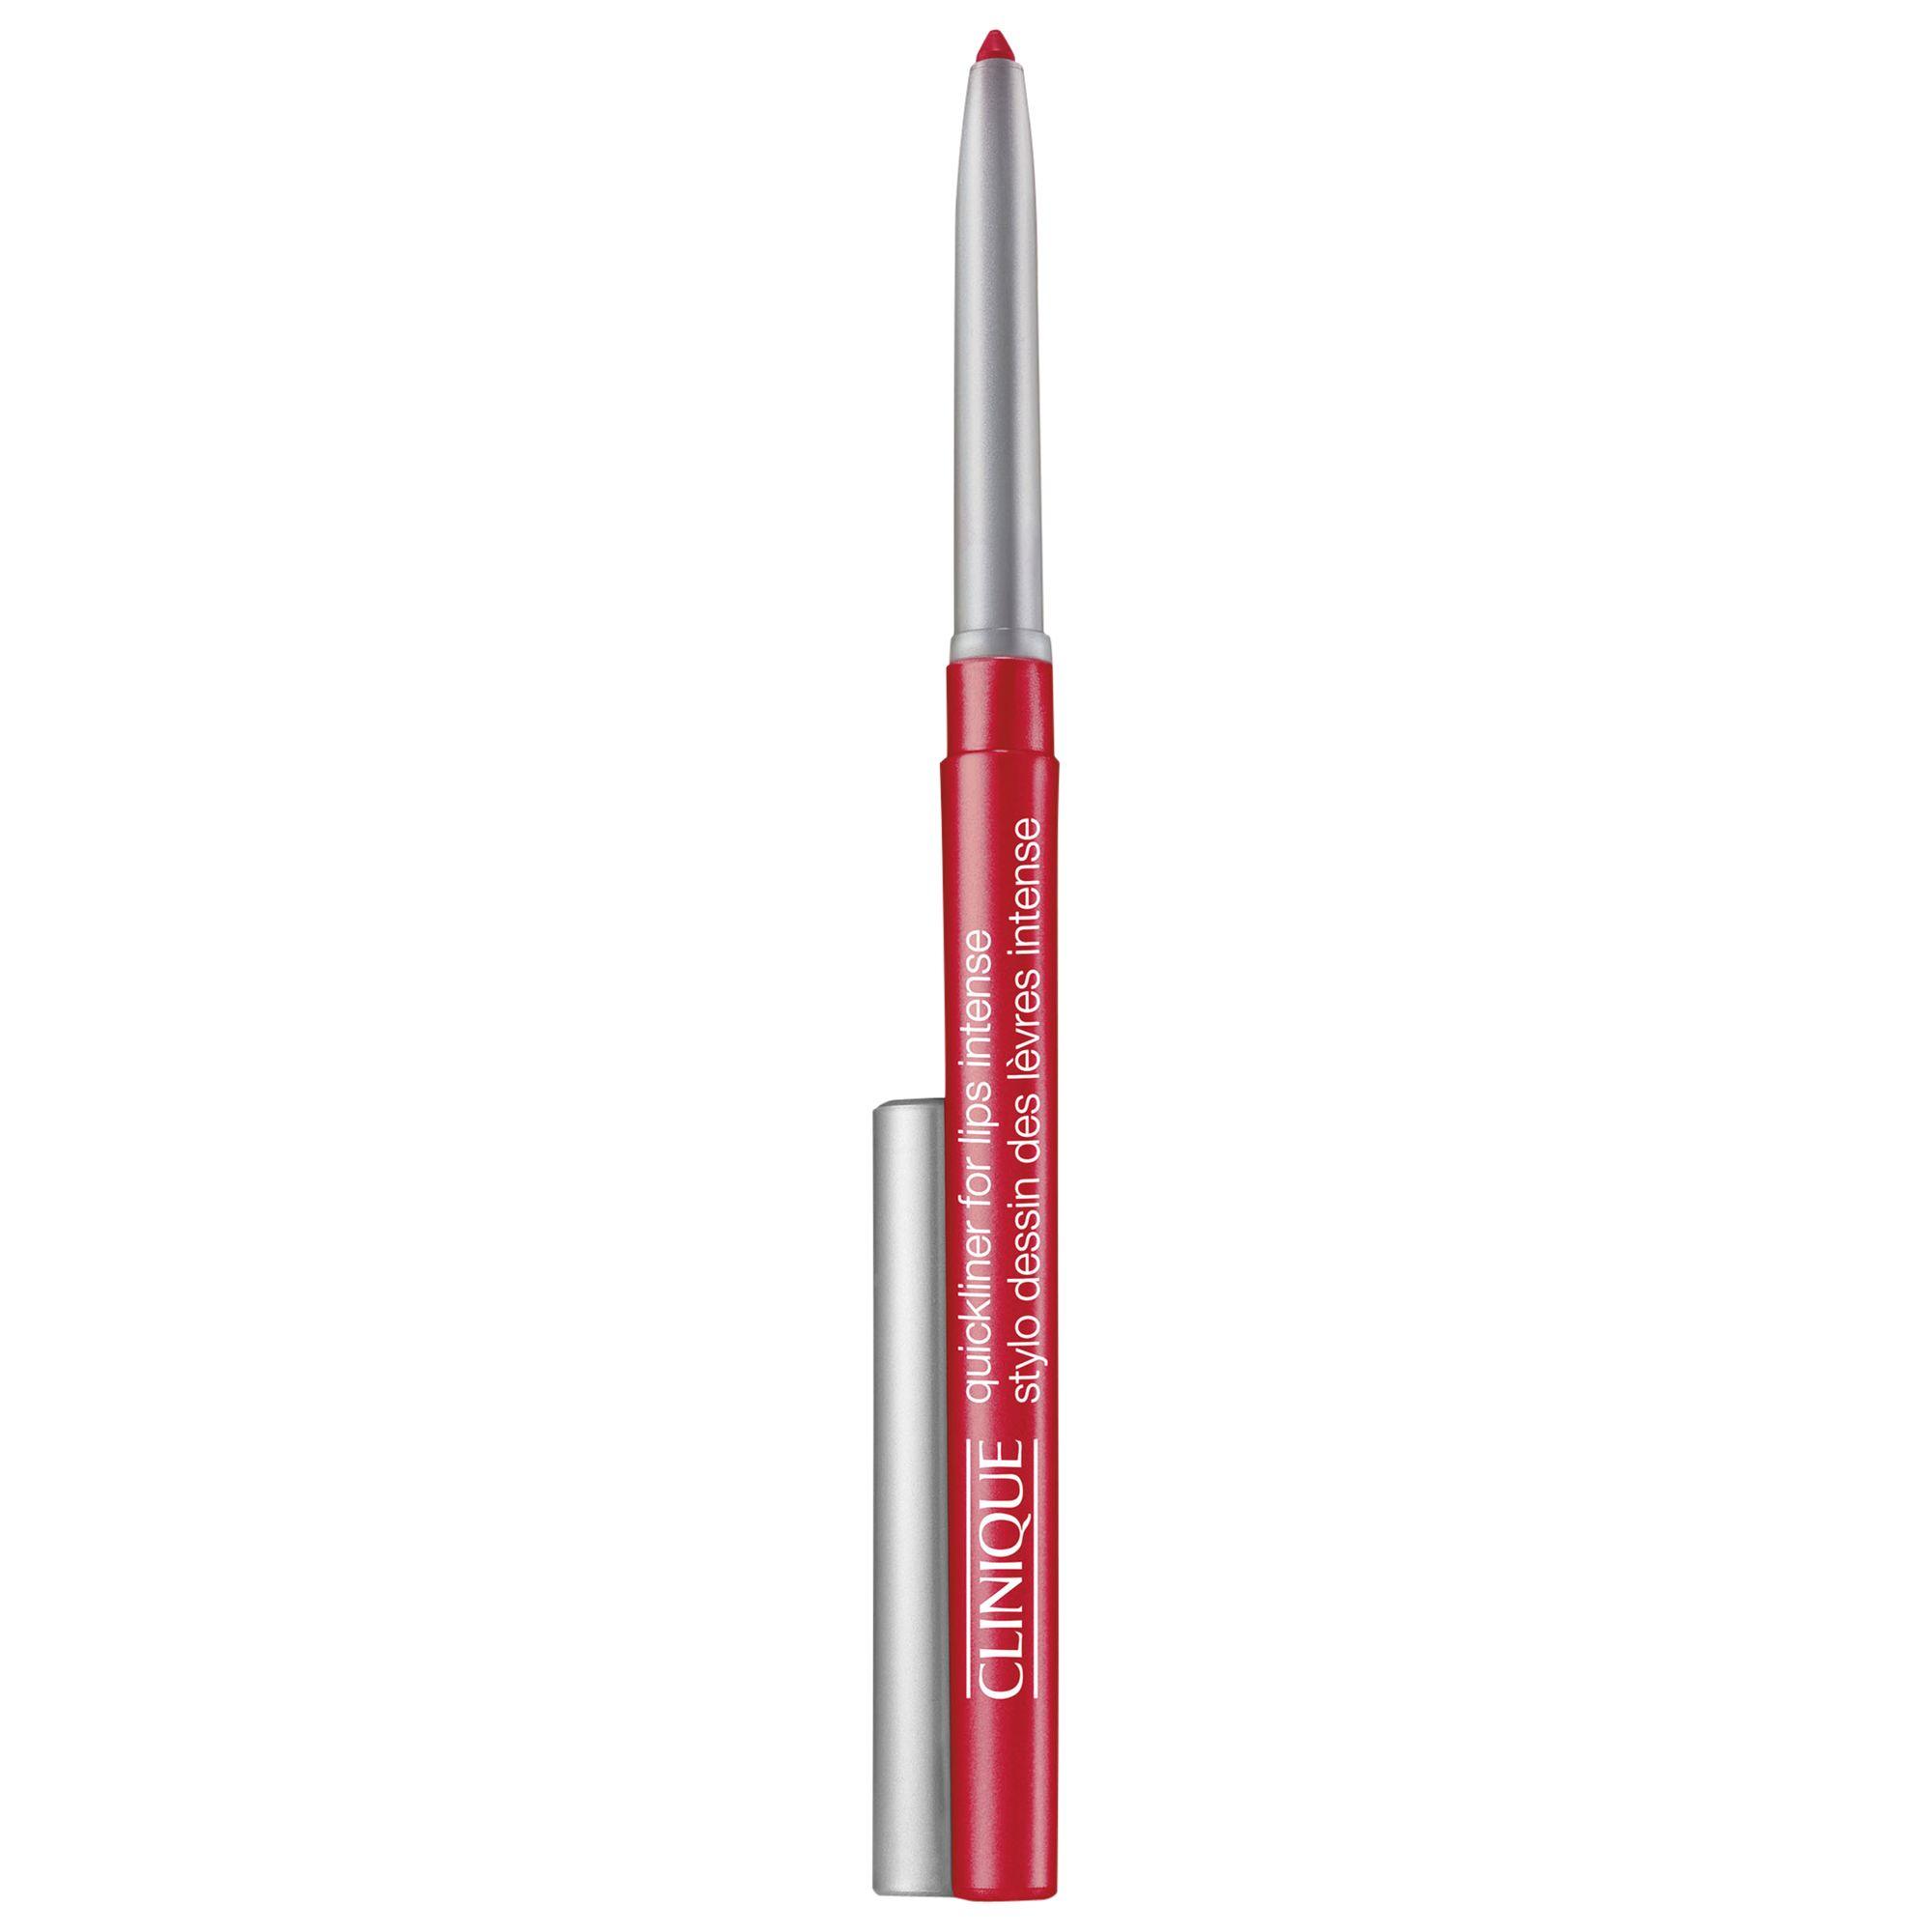 CLINIQUE quickliner for lips intense 0.3g Intense Passion